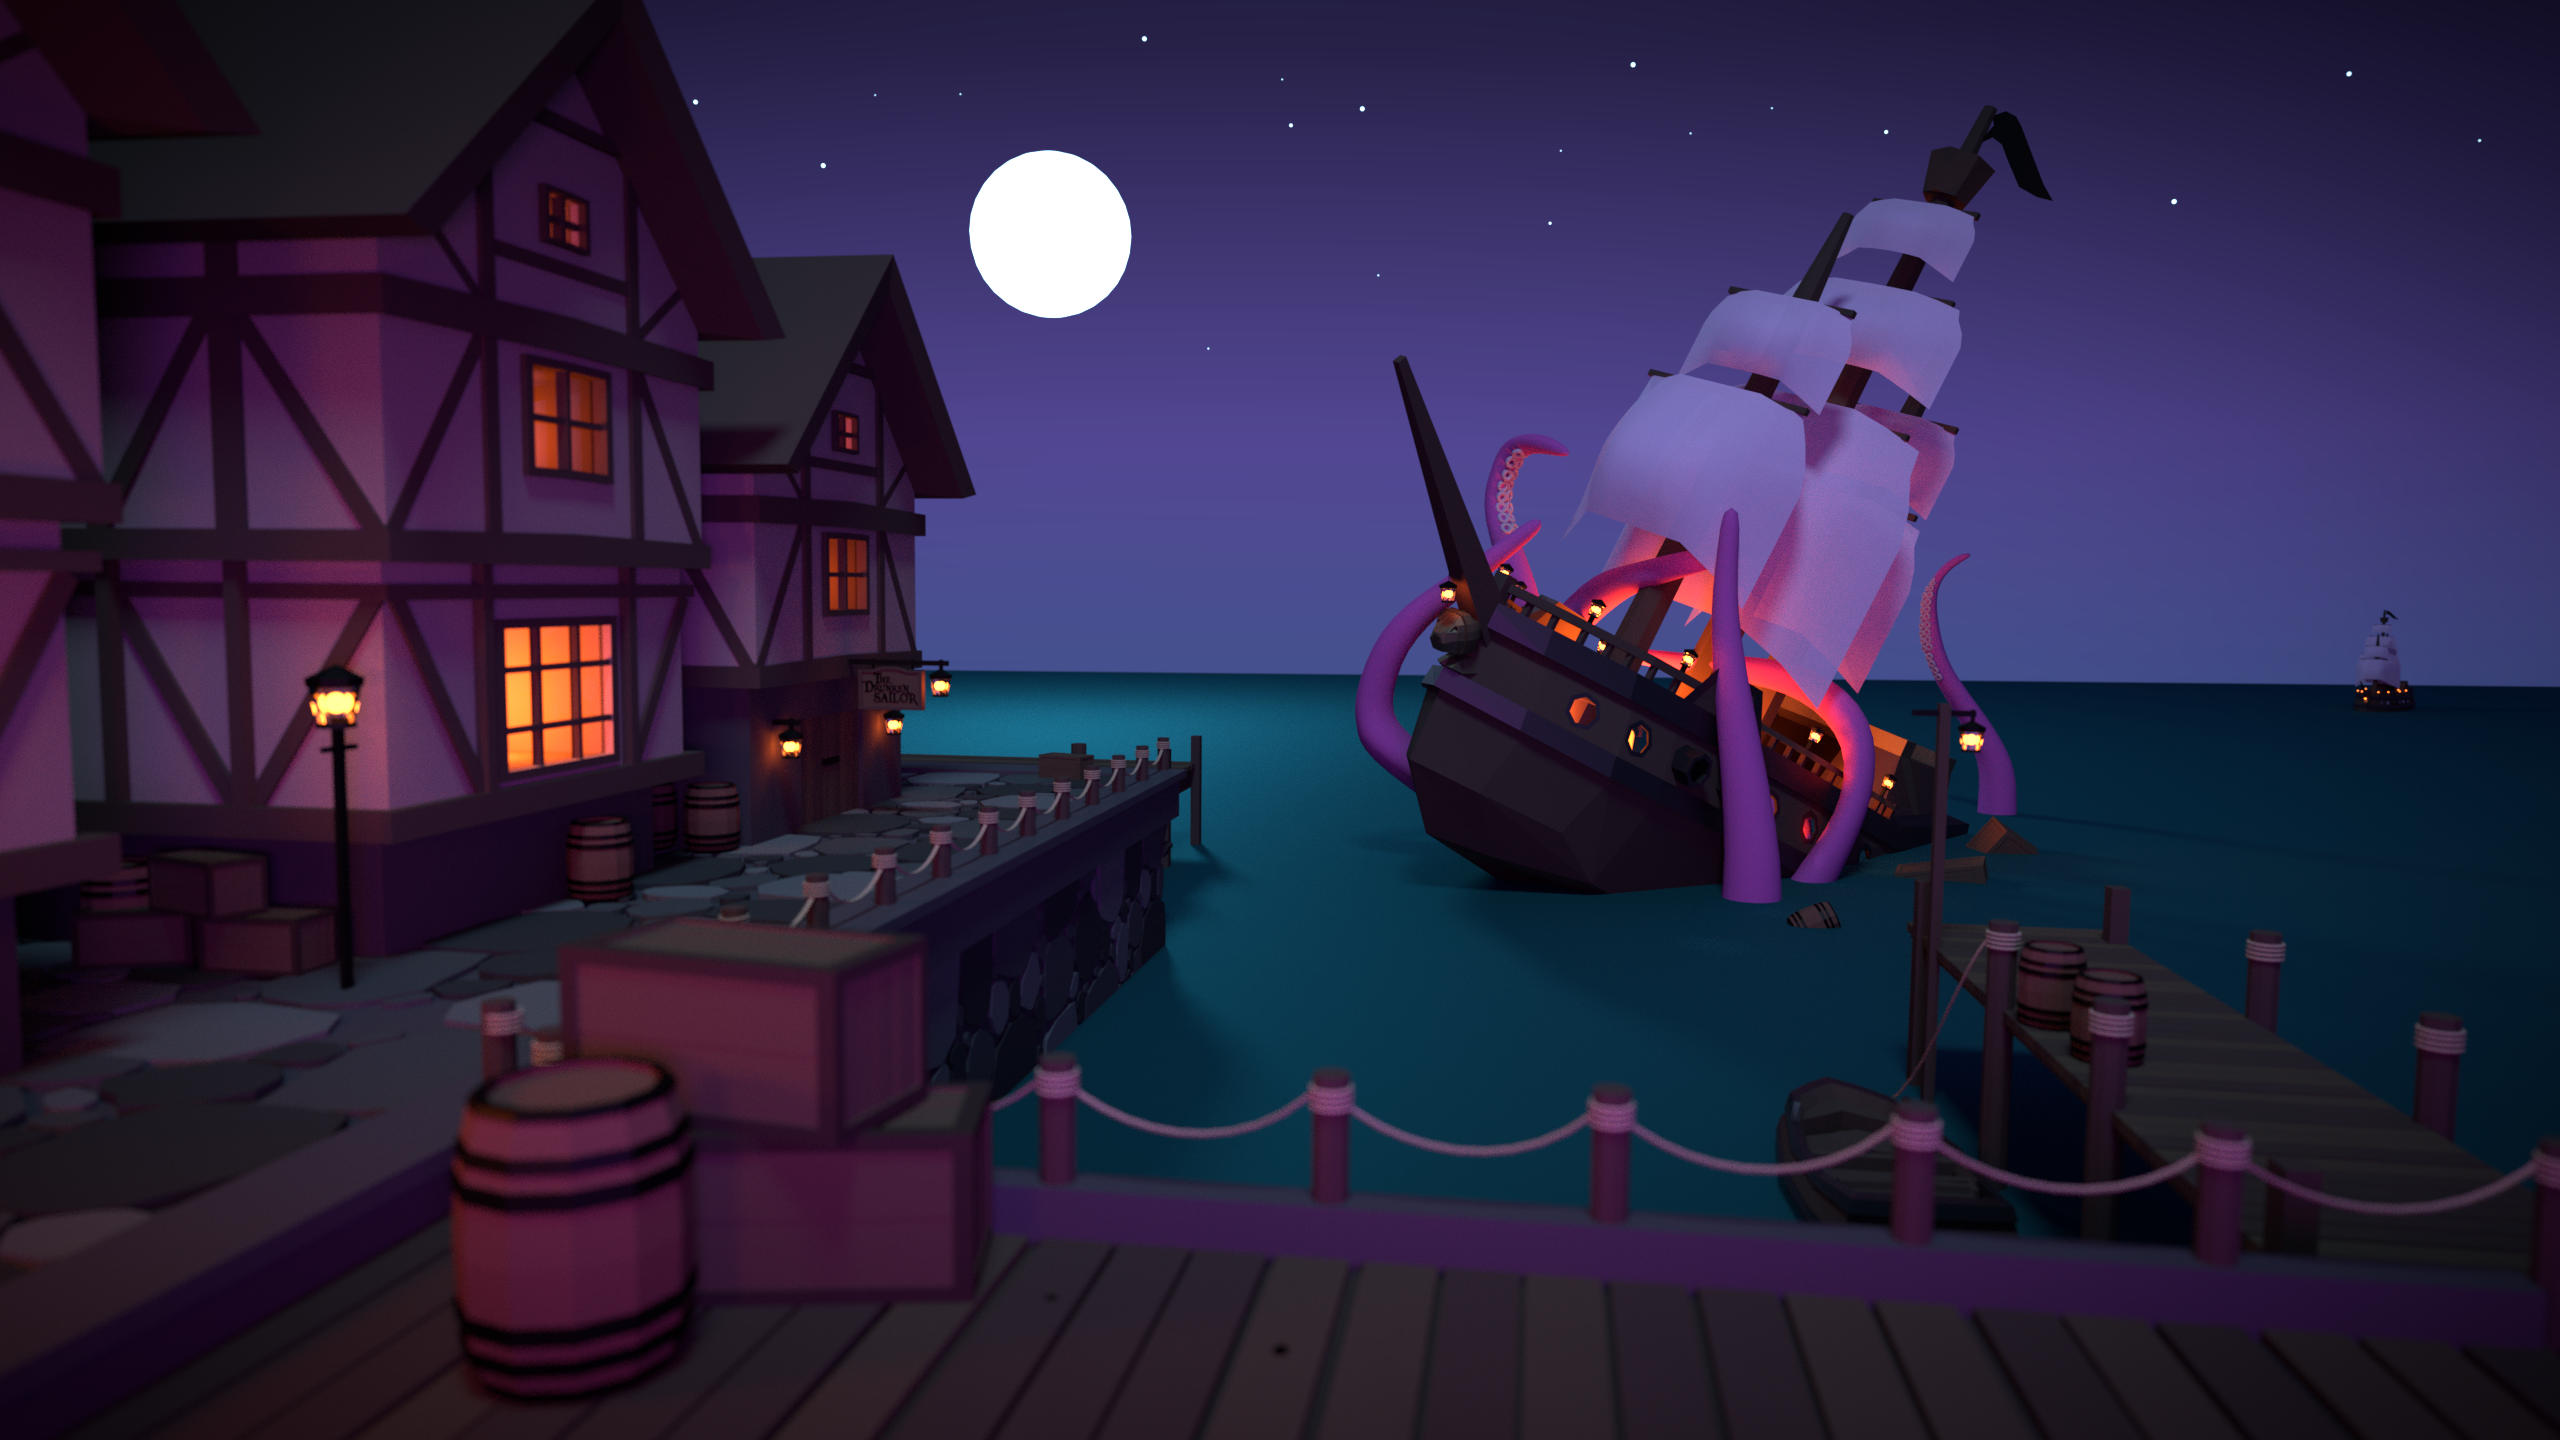 General 2560x1440 digital art ship sea sailing ship sea monsters tentacles octopus night pier house Moon stars lights Kraken